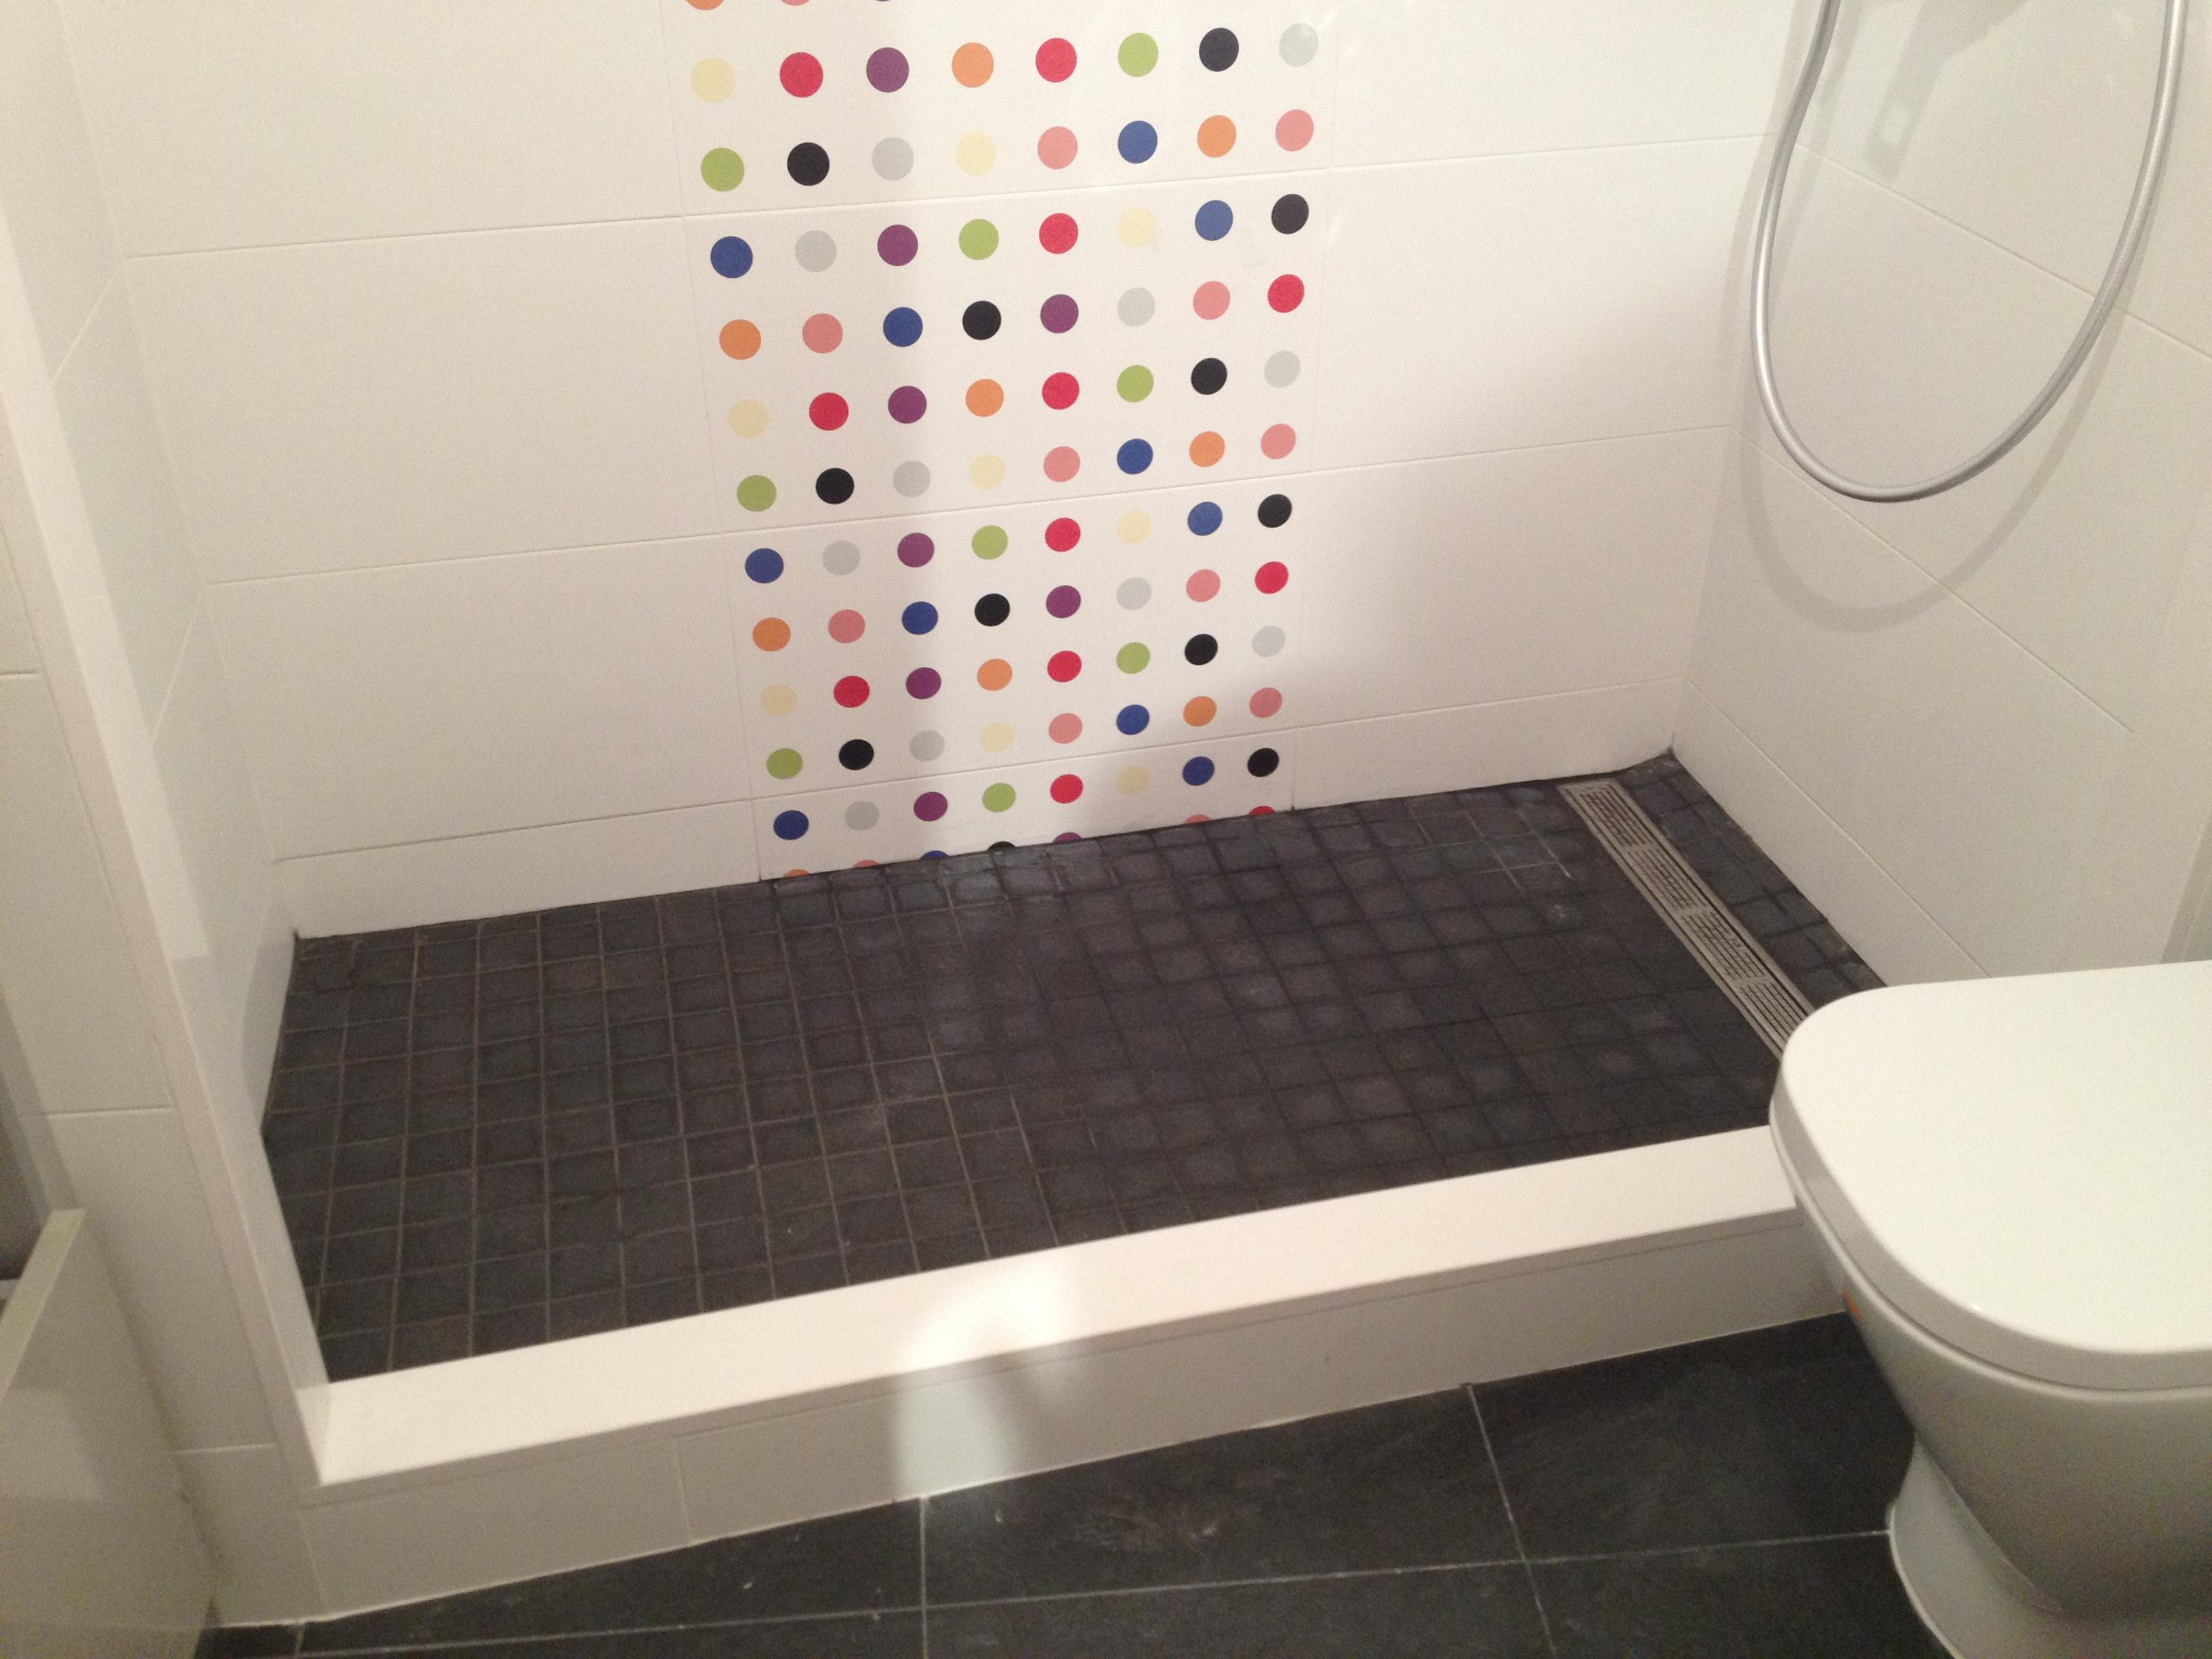 Plats de dutxa d obra prasde sl for Plats de dutxa